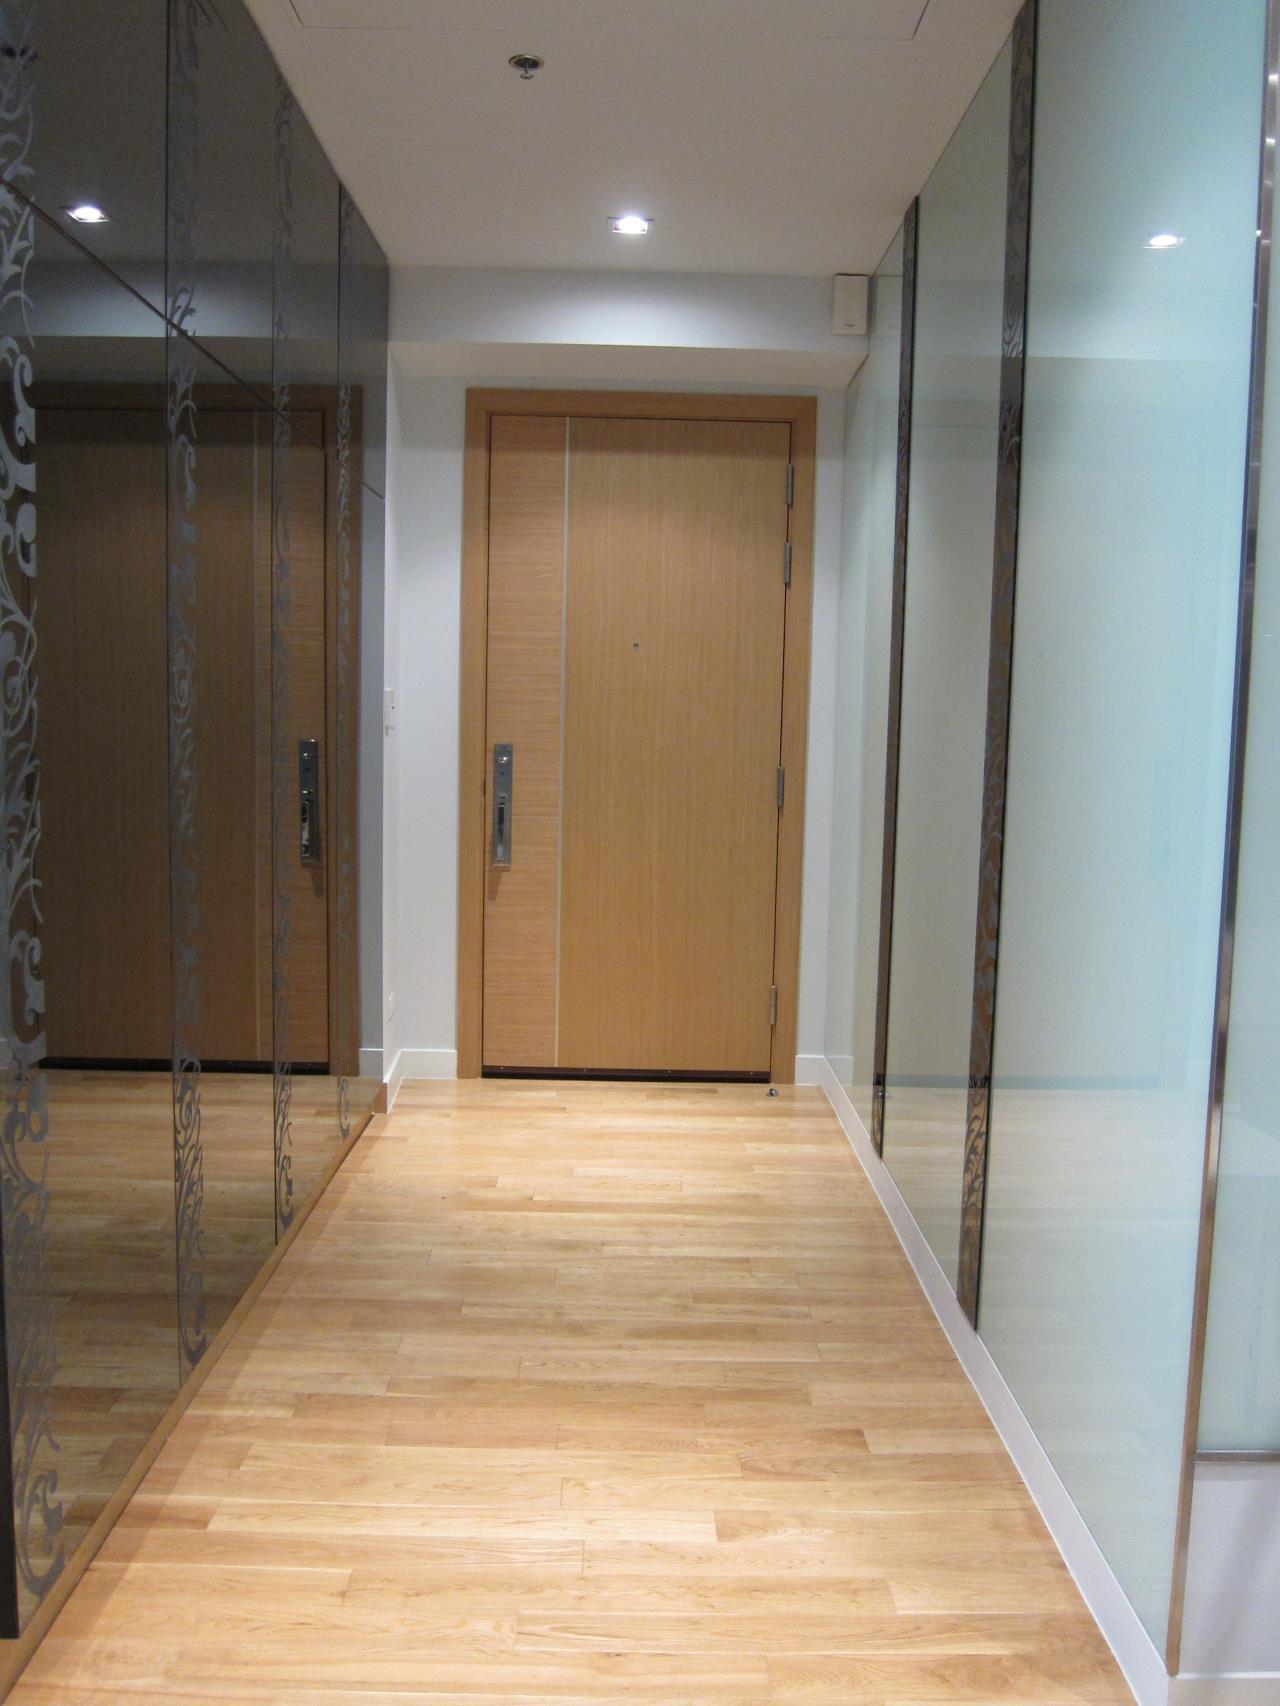 Piri Property Agency's 2 bedrooms Condominium  on tower B floor For Rent 2 3